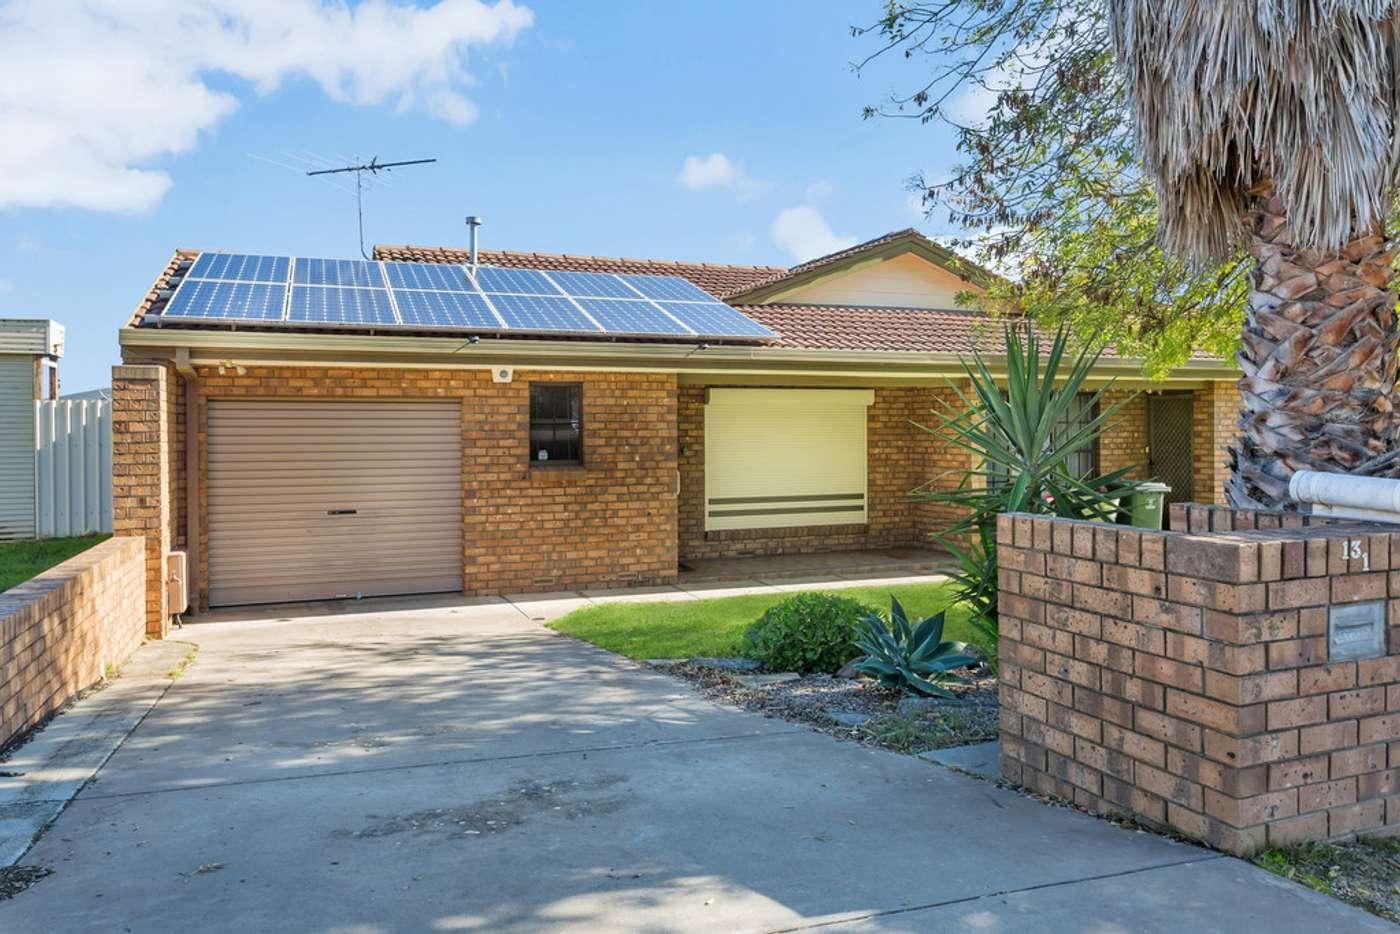 Main view of Homely house listing, 1/13 Riesling Street, Morphett Vale SA 5162